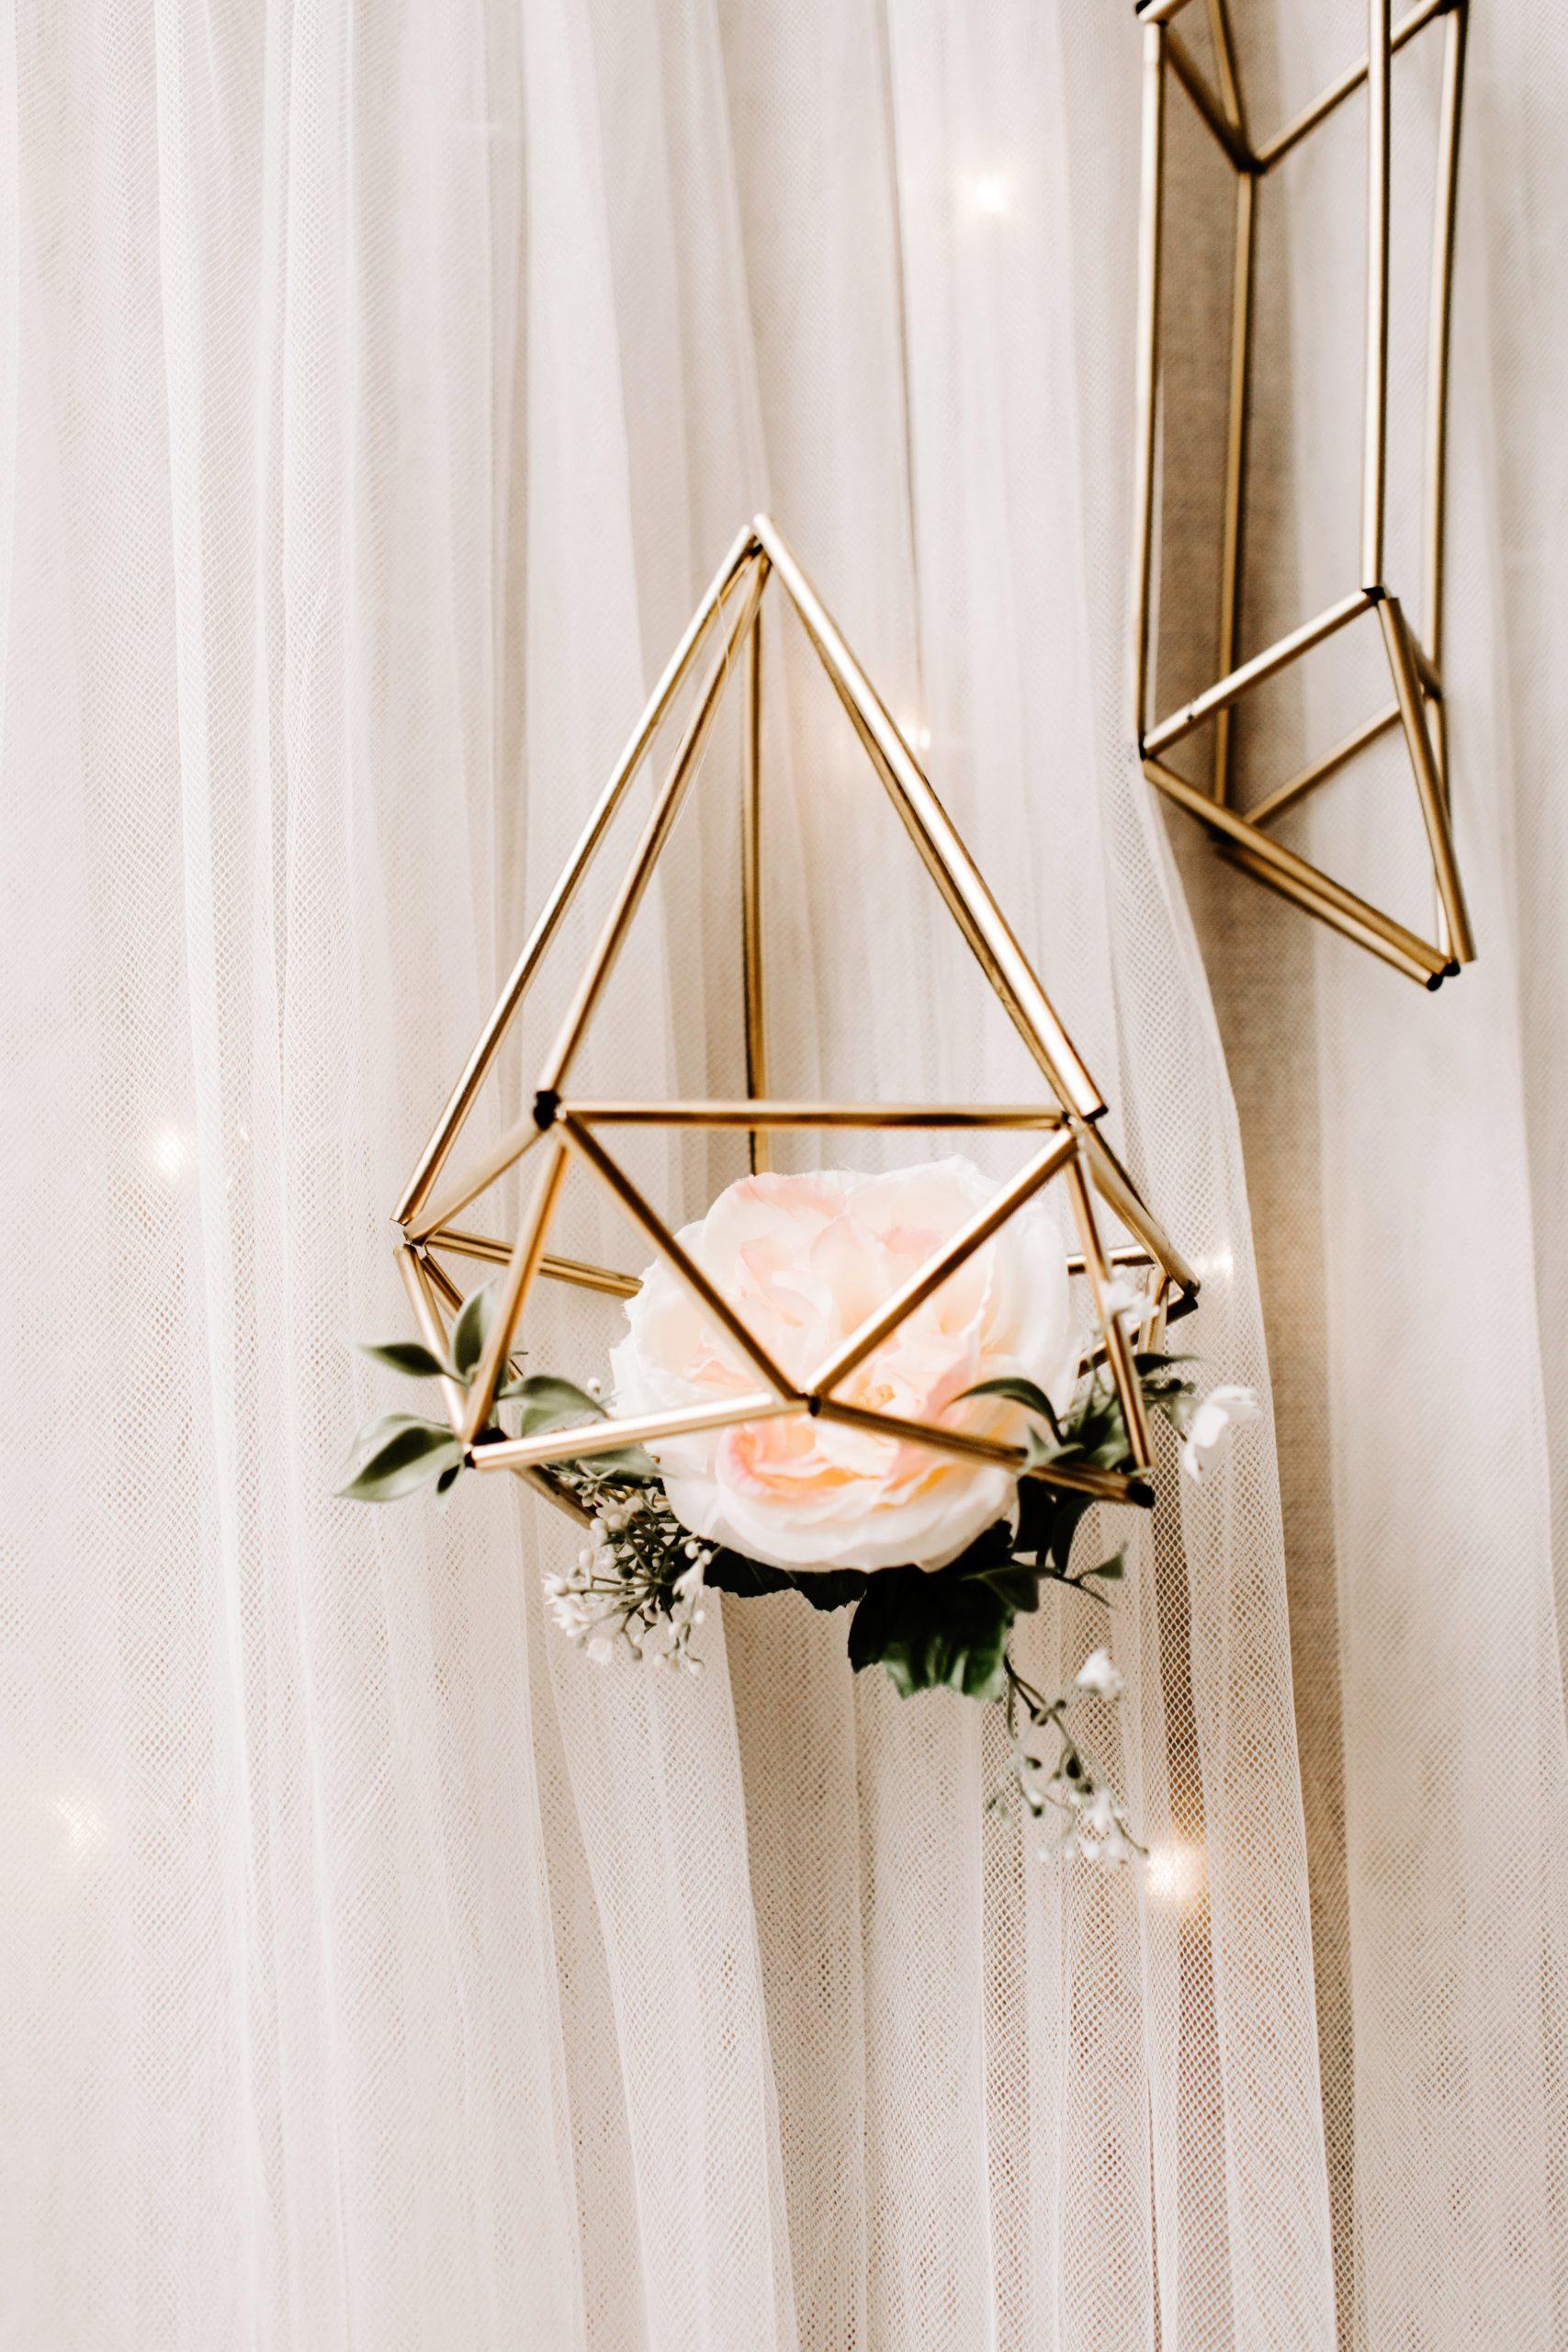 Gold geometric floral decor at wedding